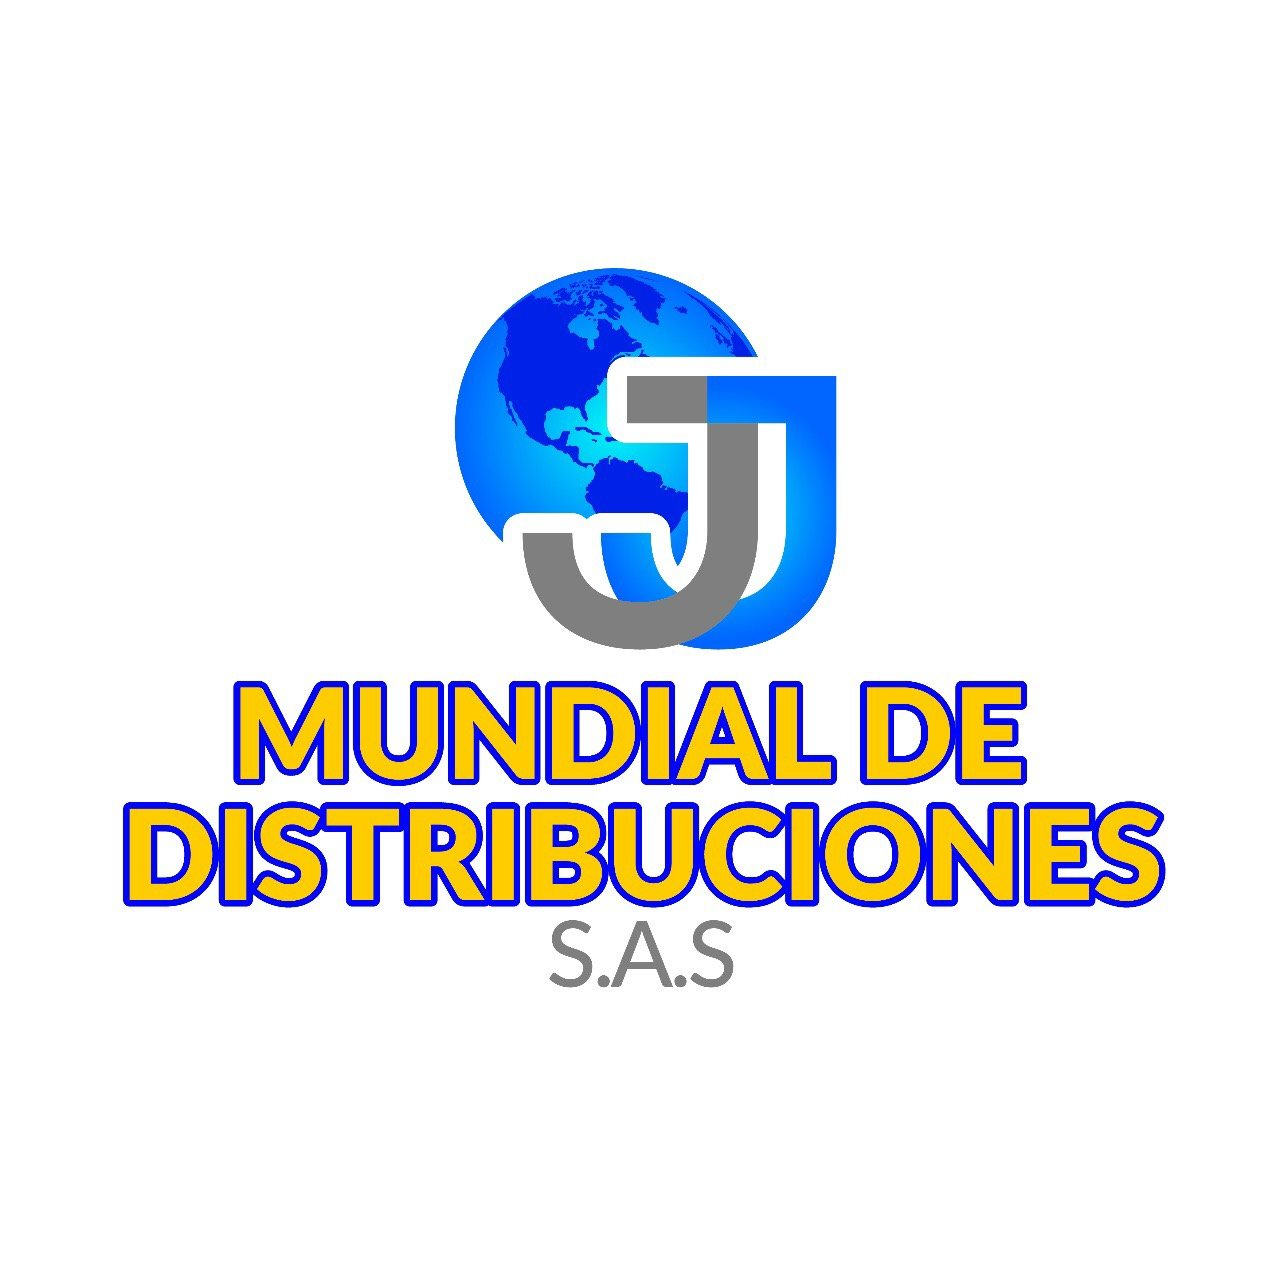 jj mundial de distribuiciones s.a.s